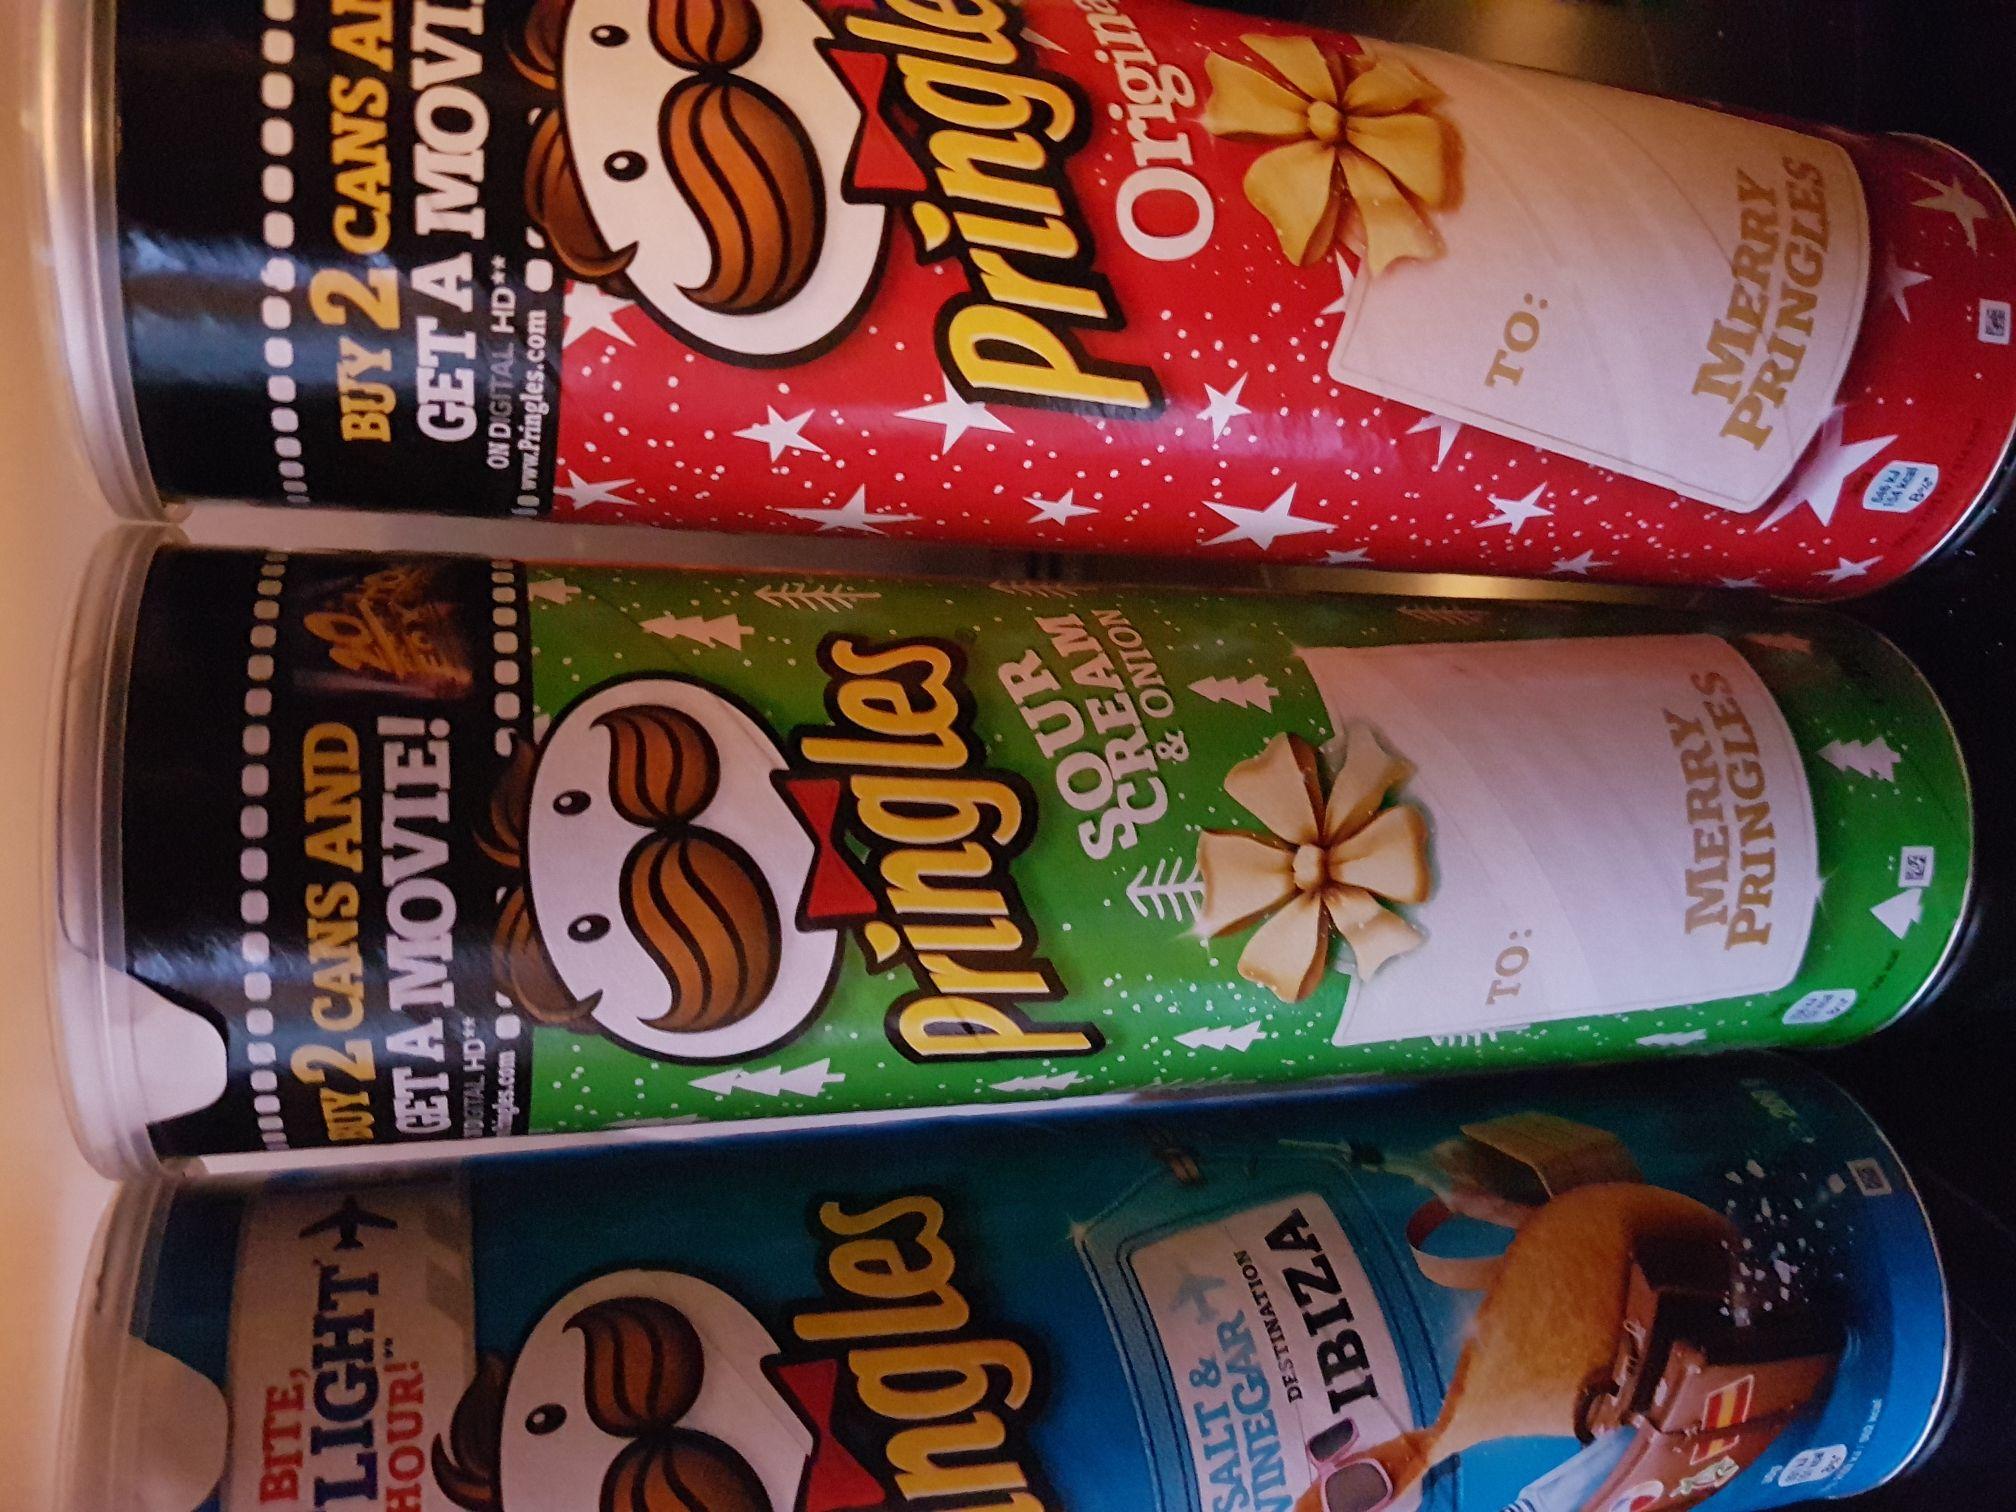 200g Pringles £1 @ Heron / Tesco and Morrisons